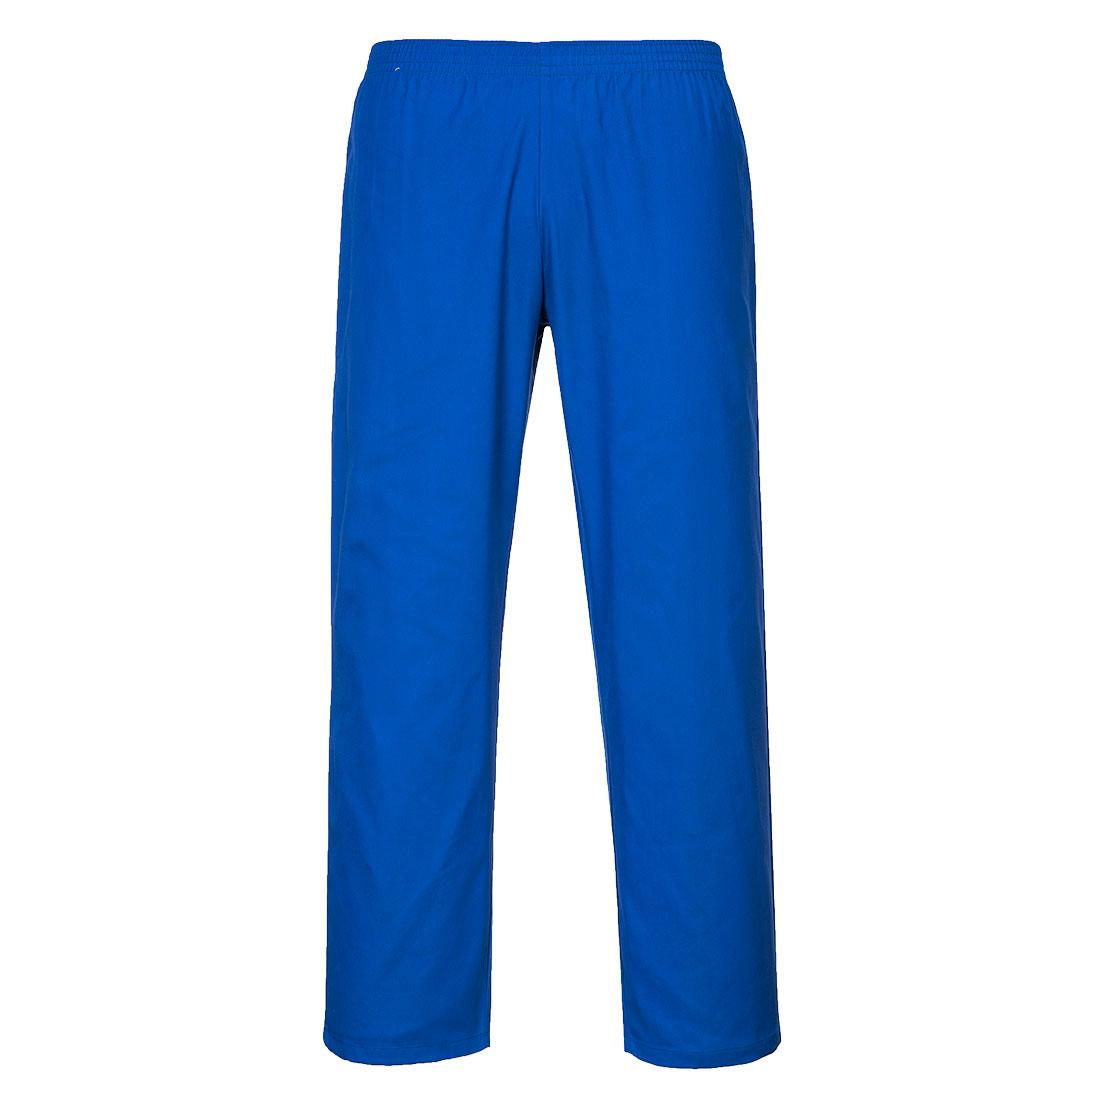 cdf576f4b5 Portwest Pék nadrág royal kék